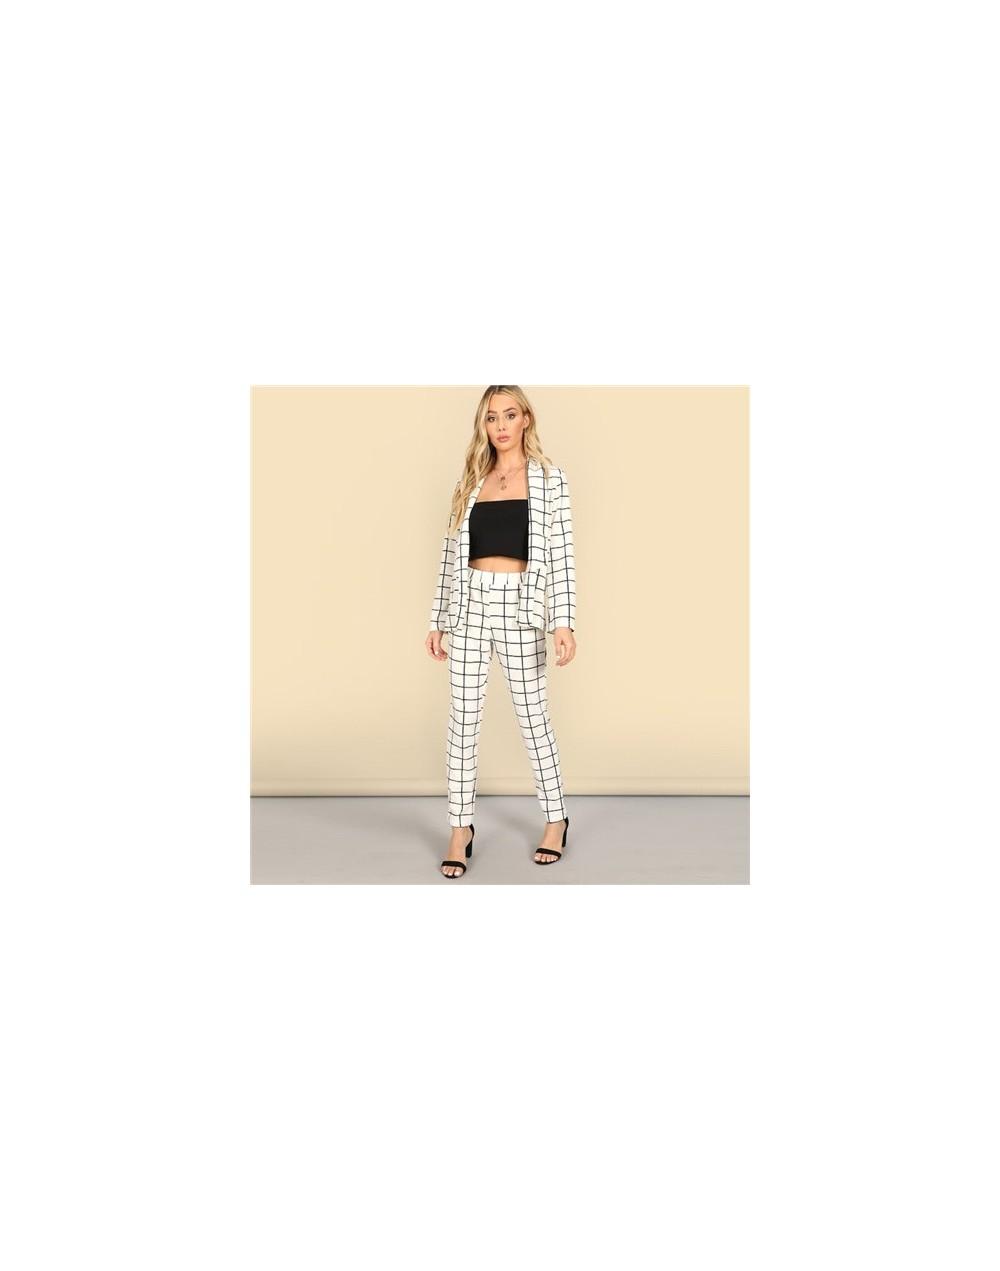 Fashion Shawl Collar Plaid Blazer And Tapered Pants Set Women Spring Elegant Workwear Plaid Blazer 2 Piece Set - White - 4A3...